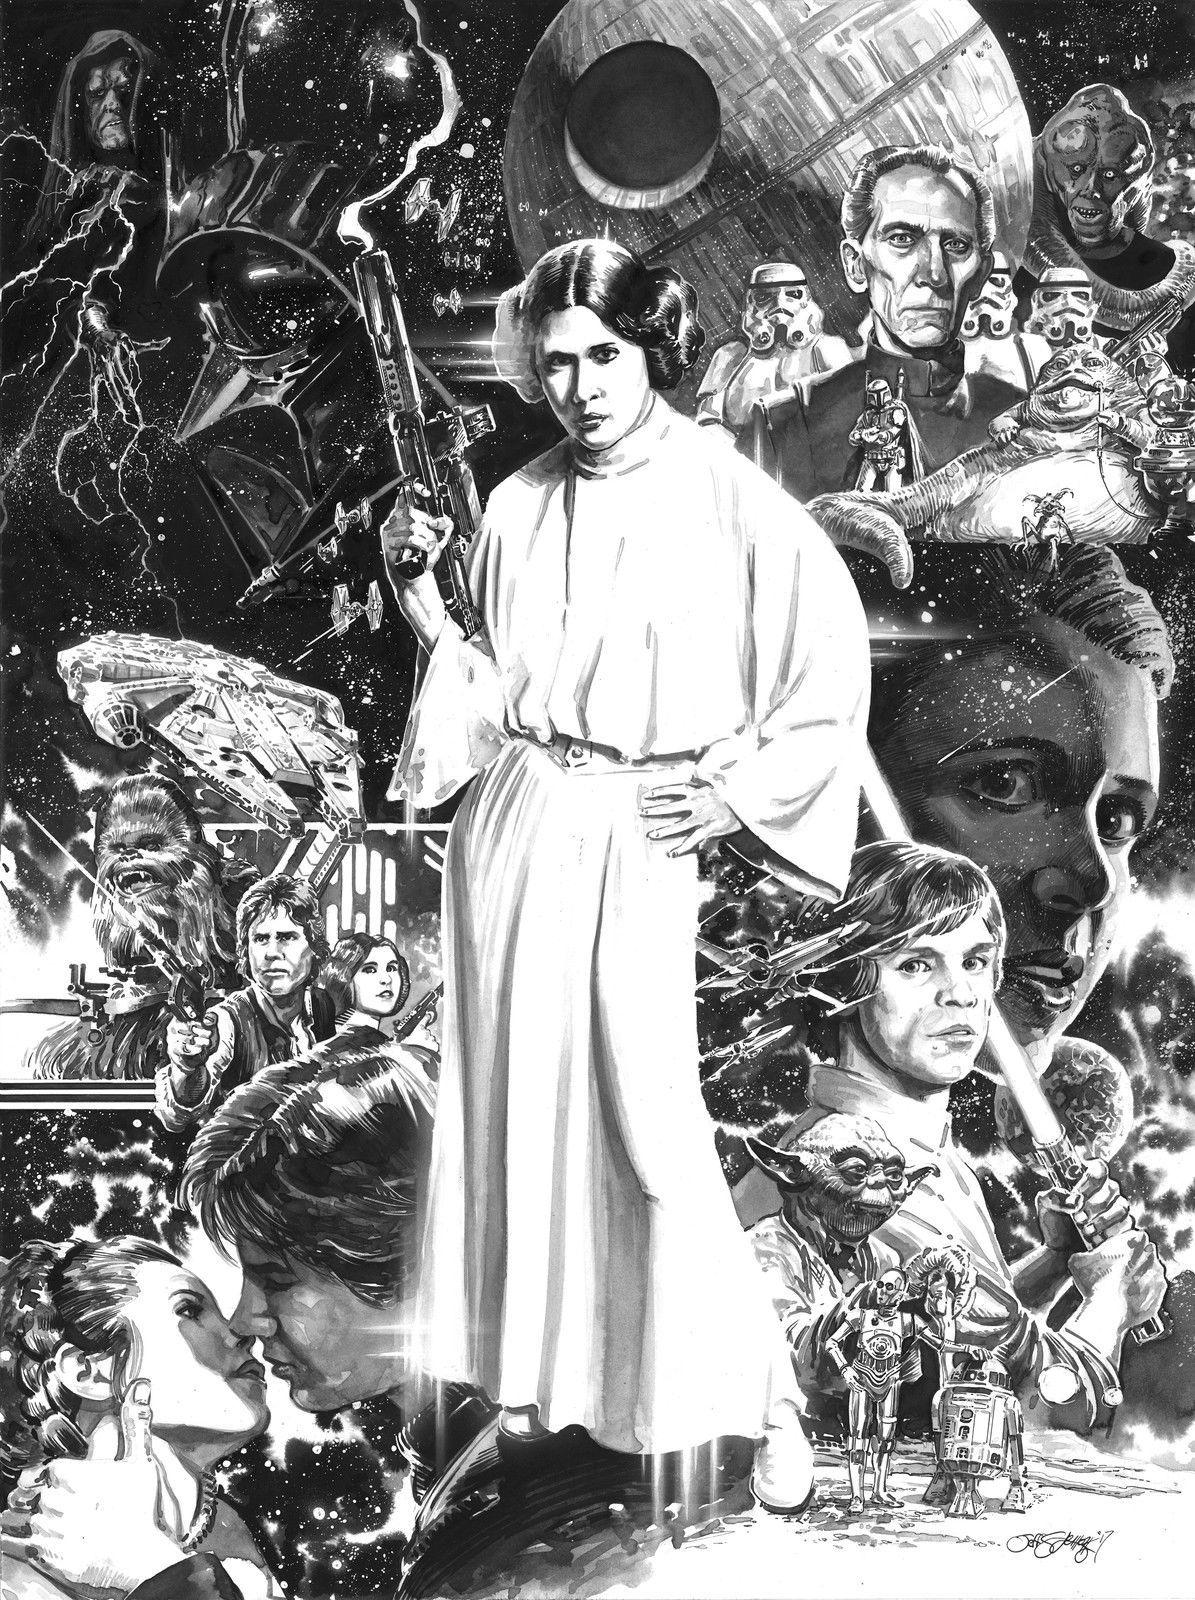 Jabba The Hutt Fucks Princess Leia Pretty star wars princess leia original pen & ink illustrationjeff